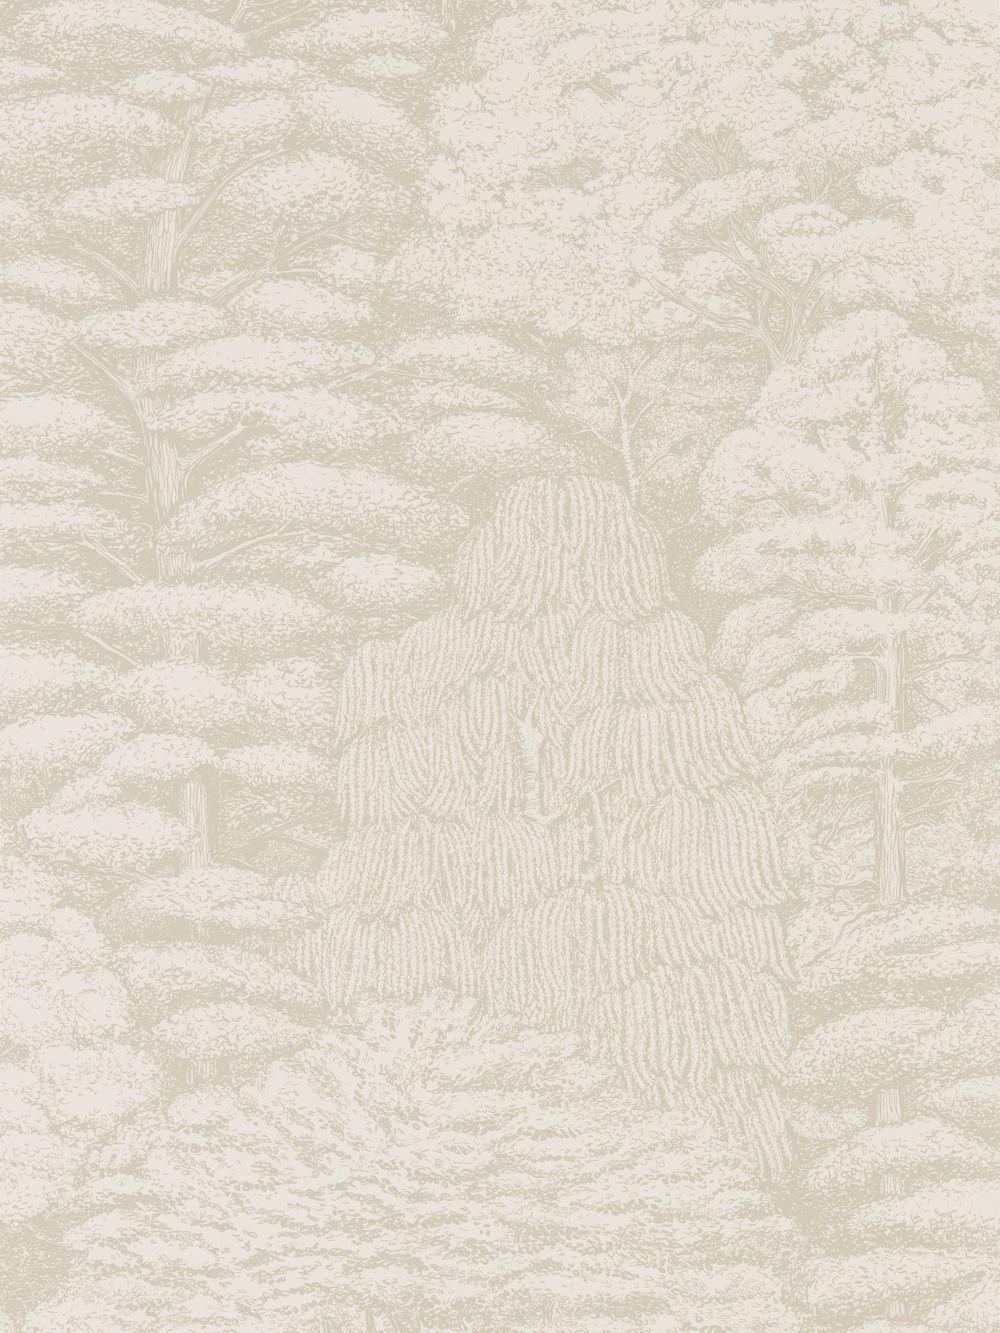 Home diy wallpaper illustration arthouse imagine fern plum motif vinyl - Woodland Toile Ivory And Neutral Wallpaper By Sanderson